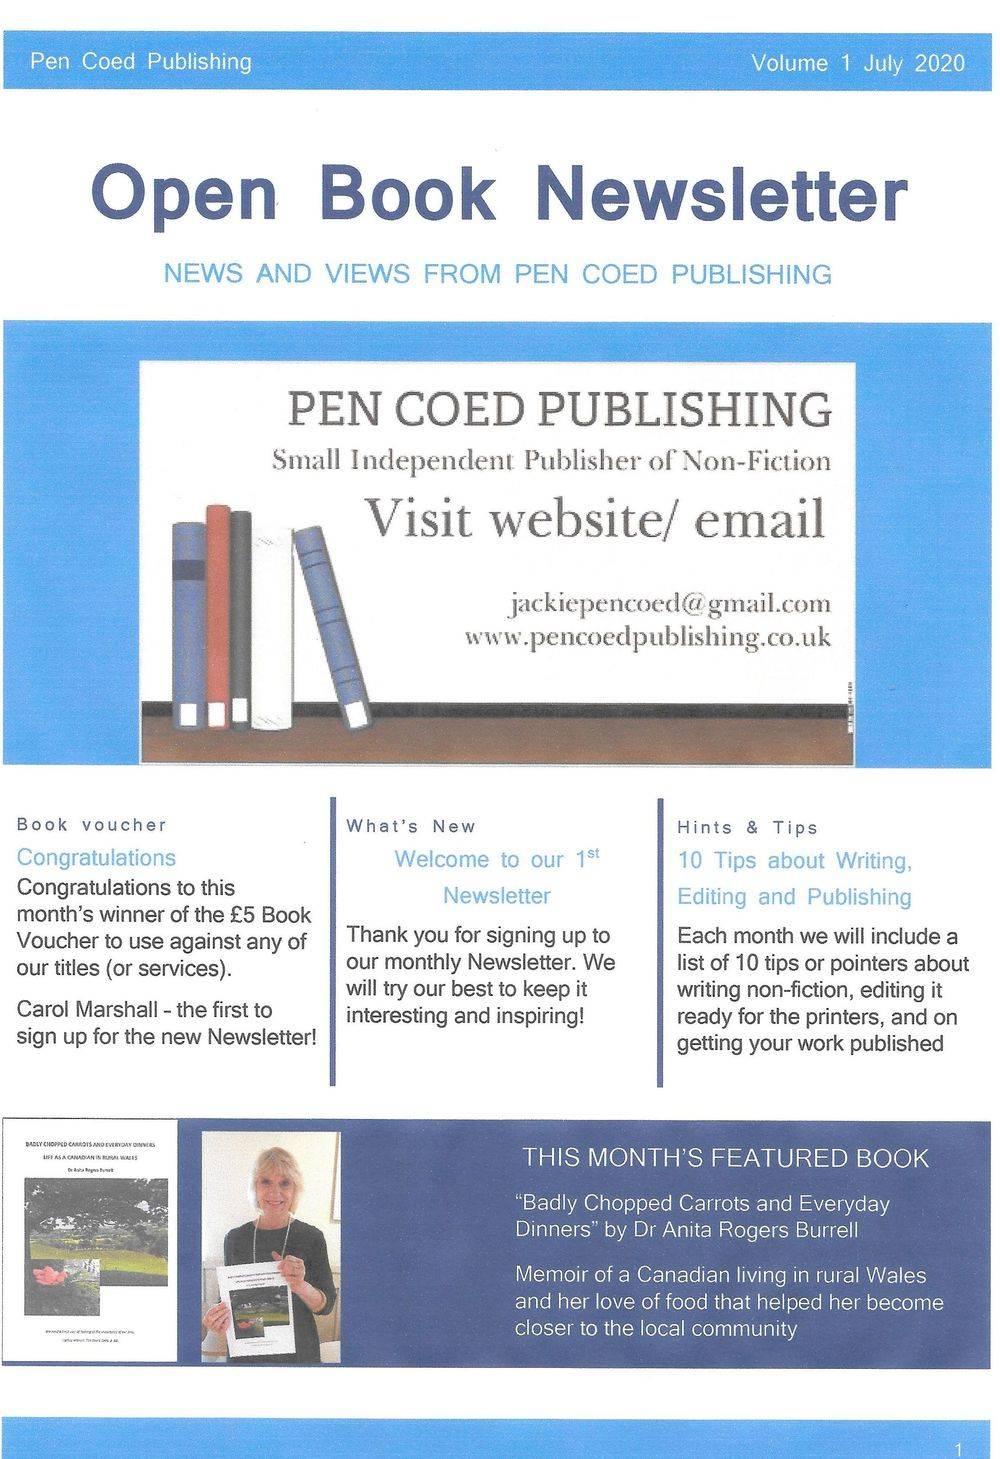 Pen Coed Publishing, Newsletter